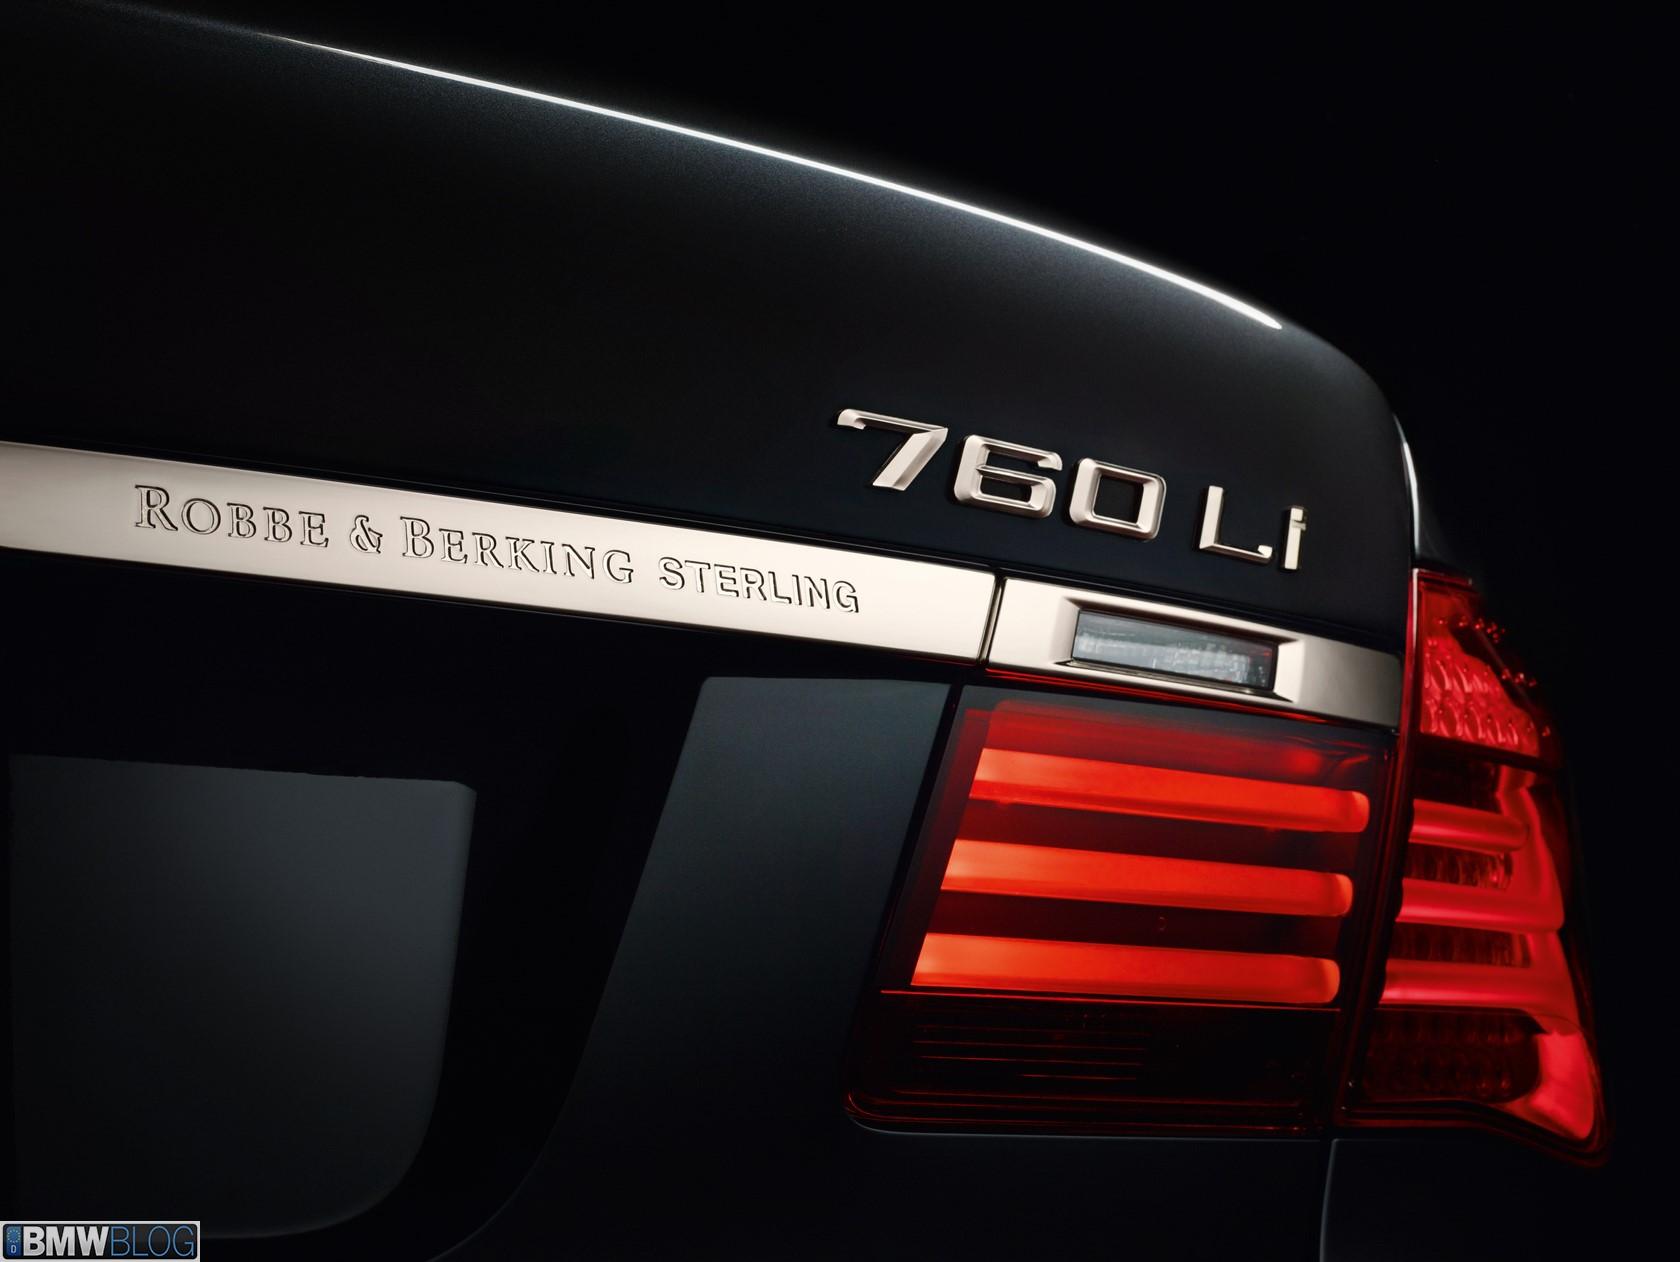 BMW Individual 760Li Sterling ROBBE BERKING06